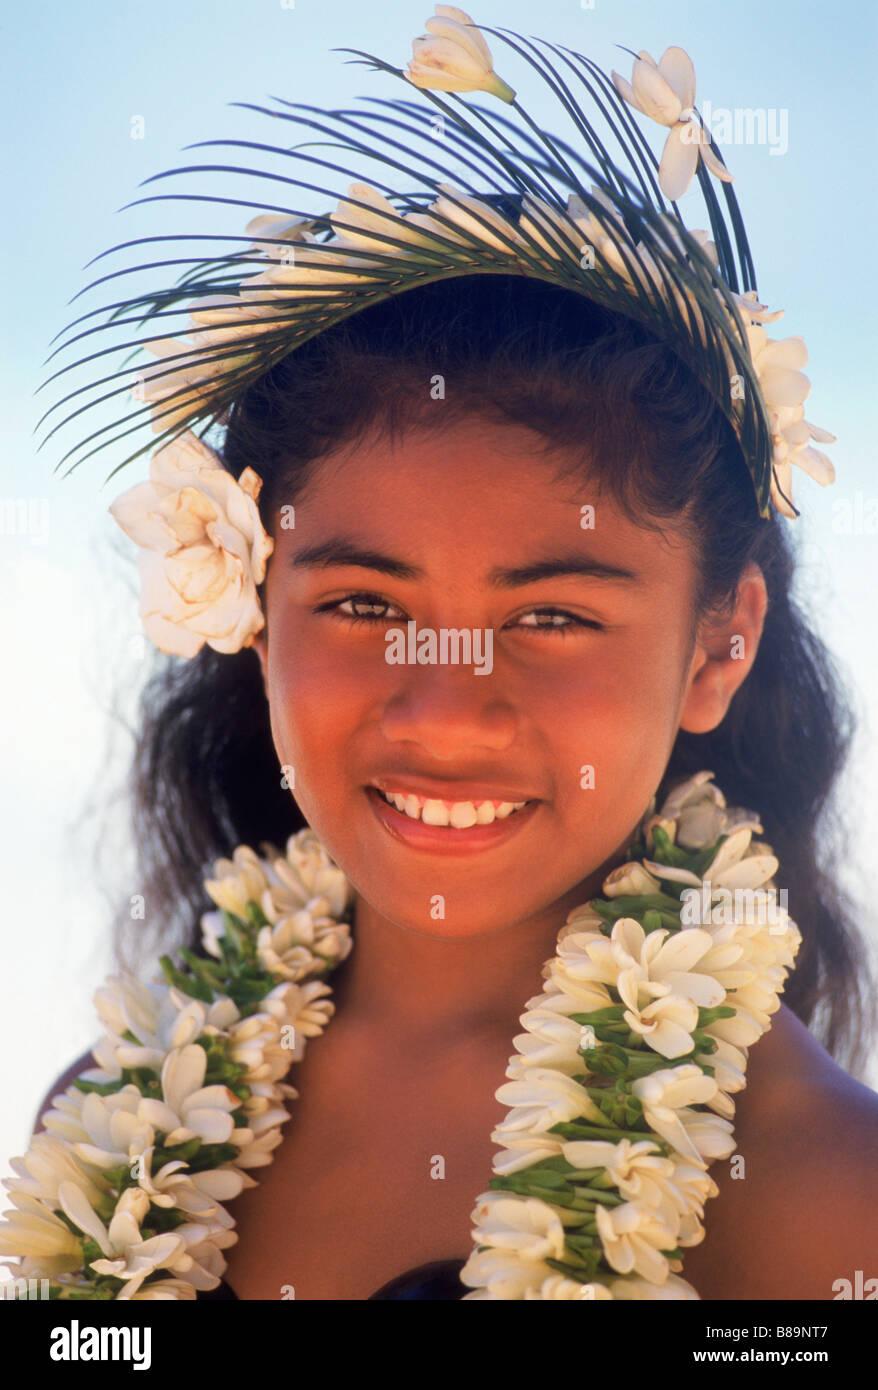 Island Girl Candy Mac Velvet Teddy Dupe: Pacific Islander Babes